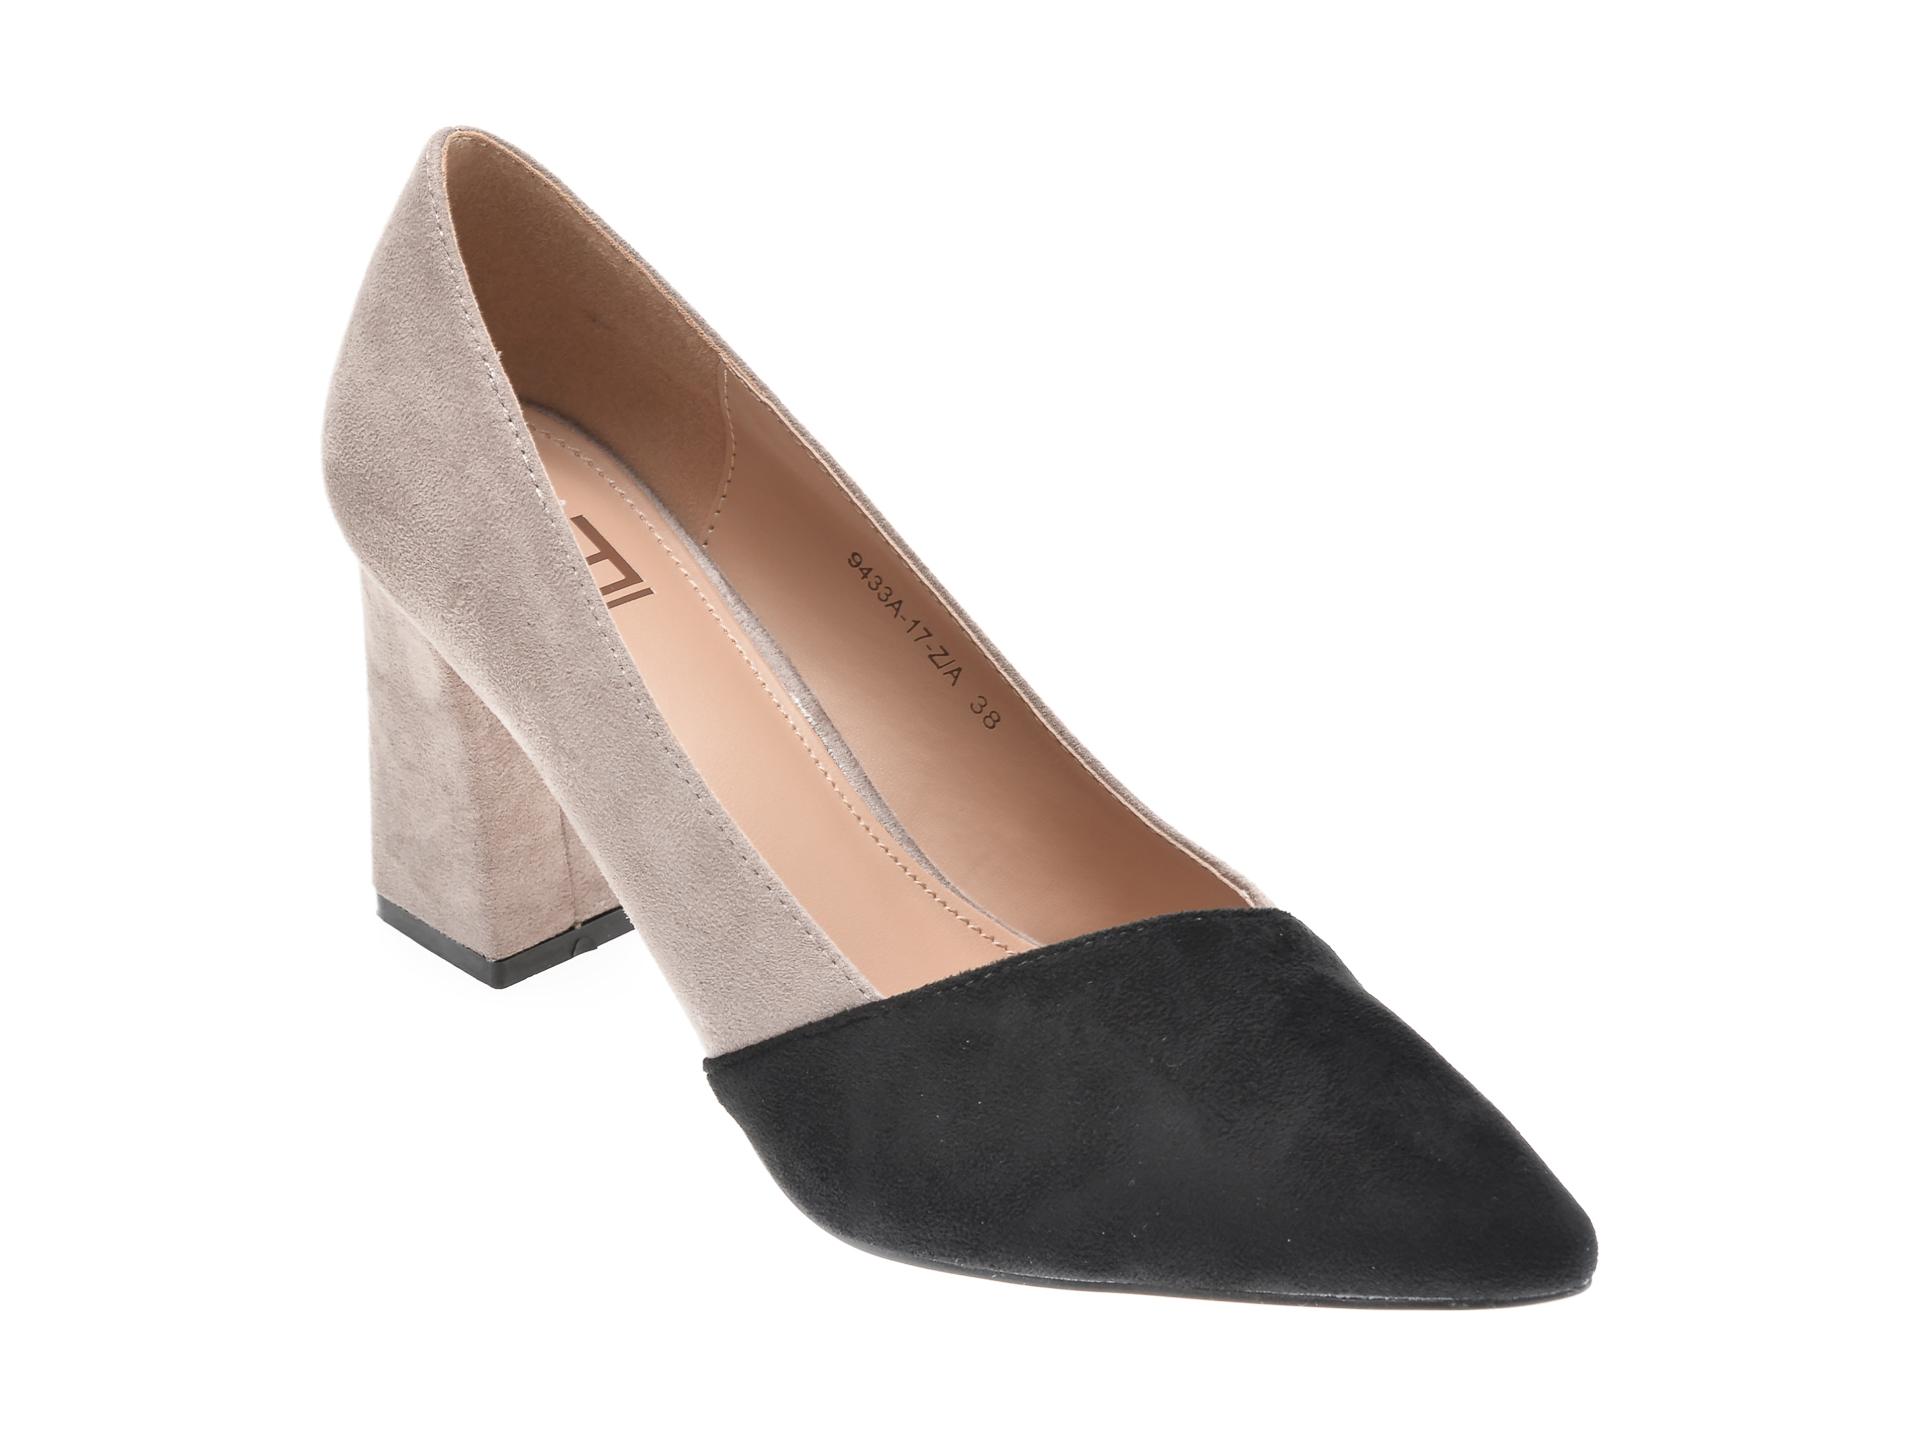 Pantofi RIO FIORE negri, 9433A, din piele ecologica imagine